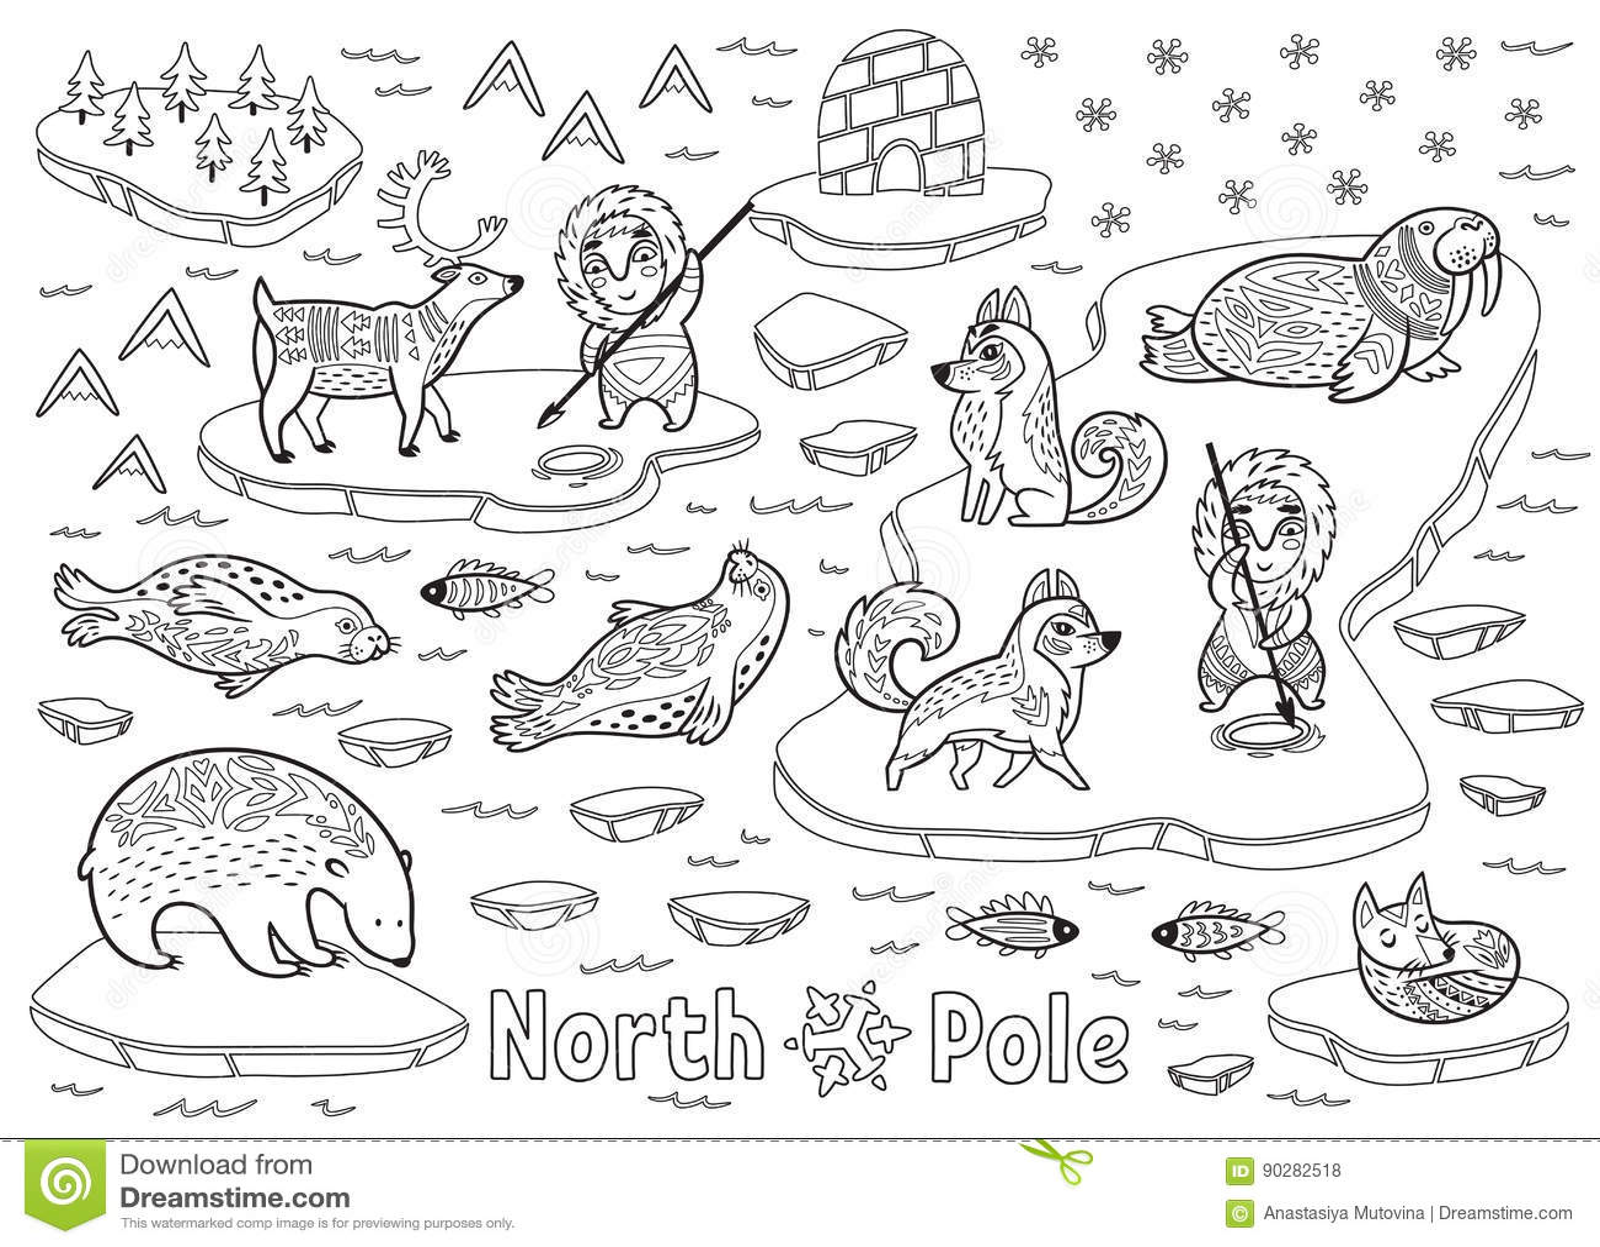 Outline North Pole Animals Eskimos And Yurt Stock Vector